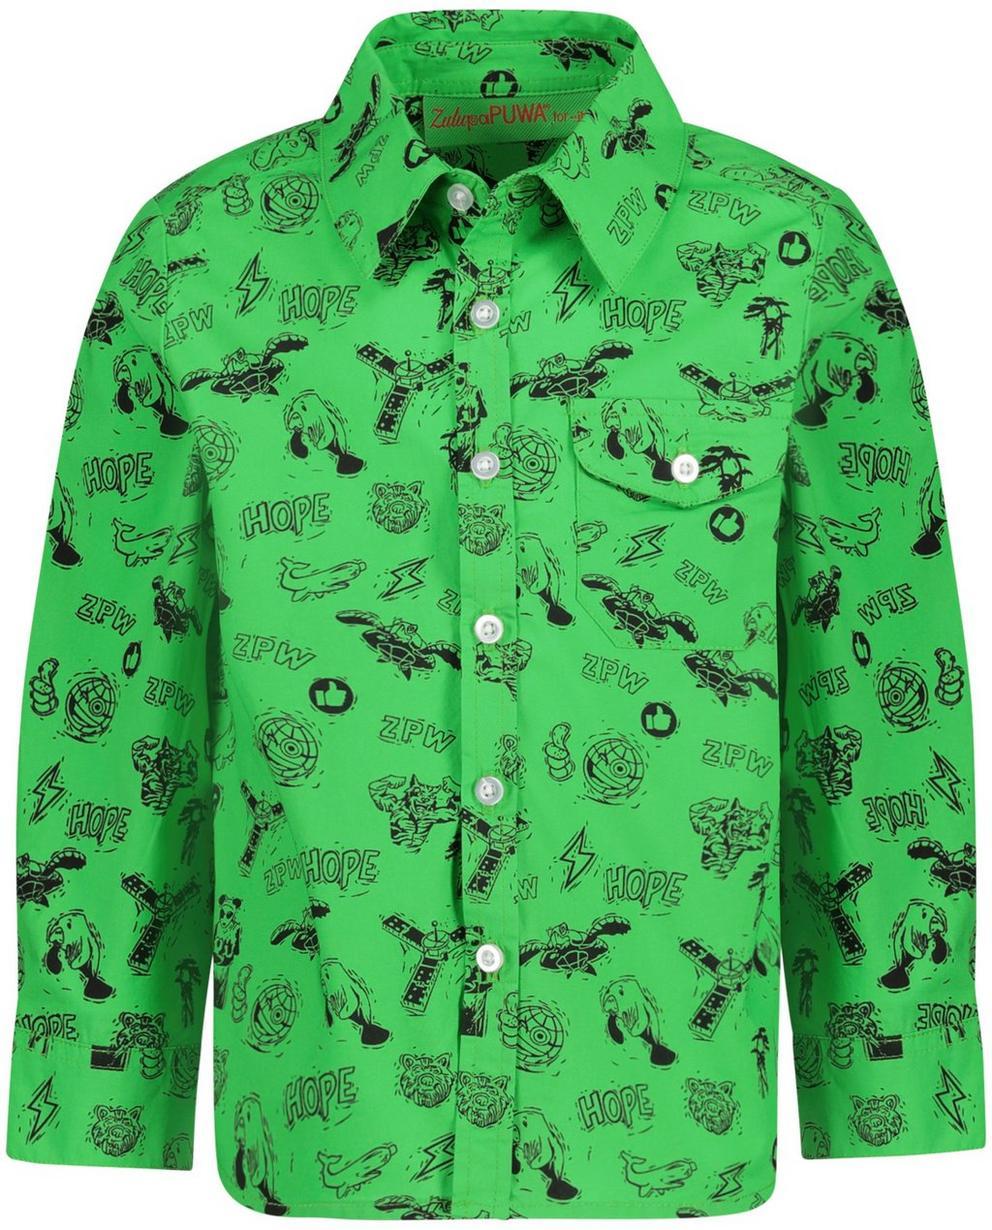 Chemises - Chemise verte à imprimé